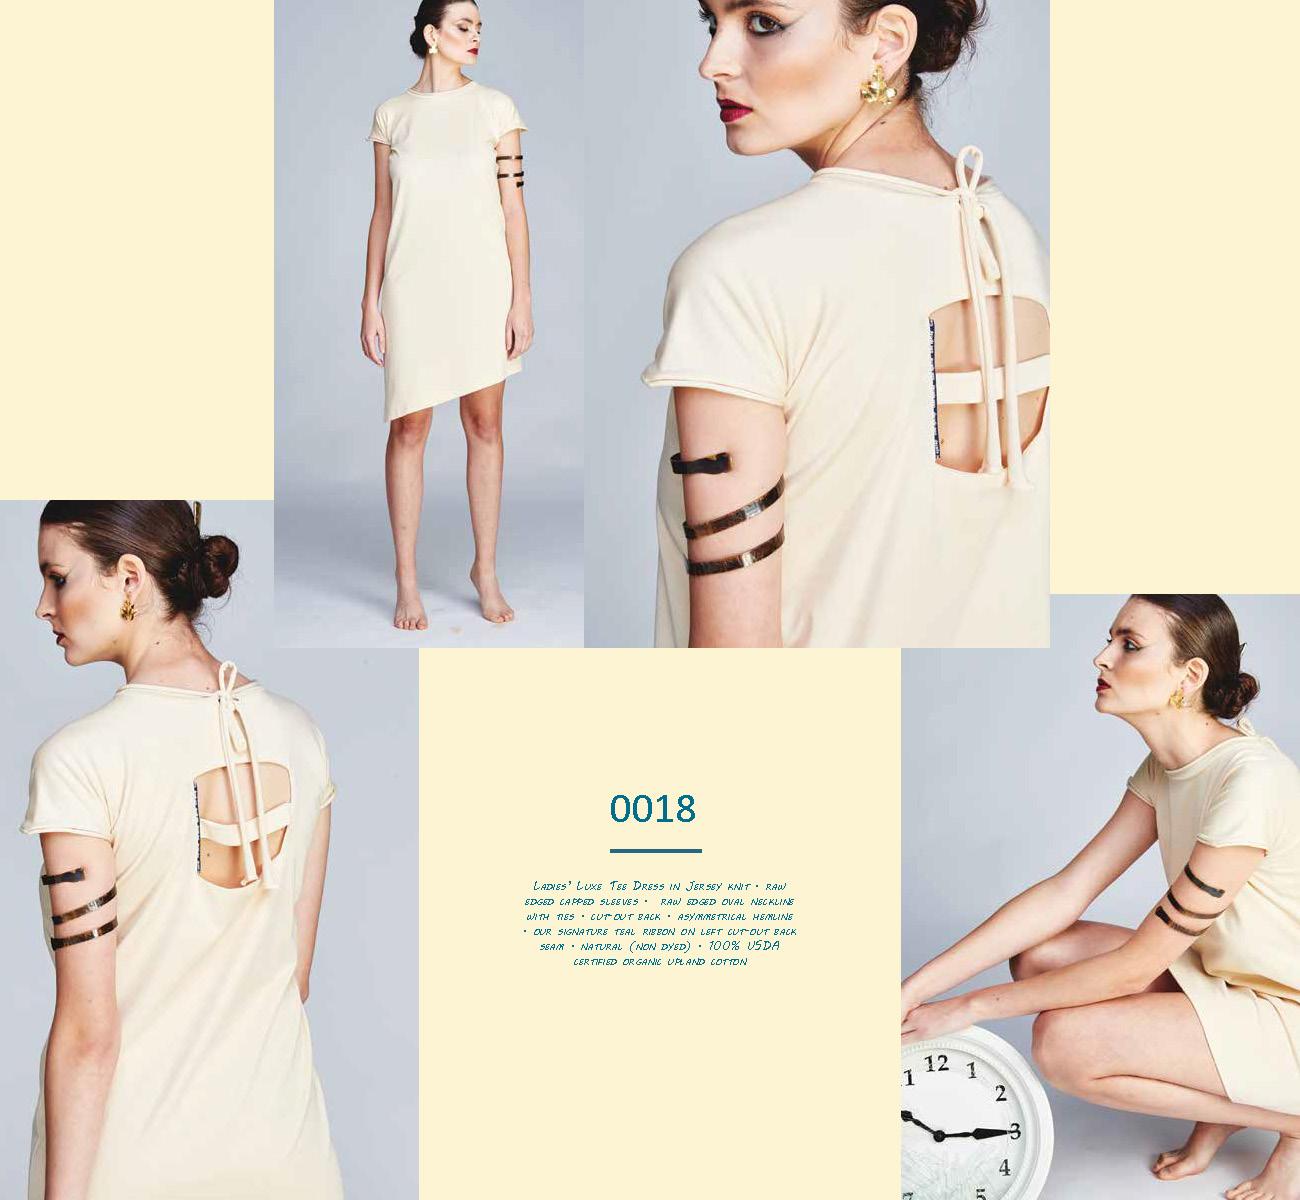 MAYD+IN+CHYNA+lookbook+2_Page_17.jpg